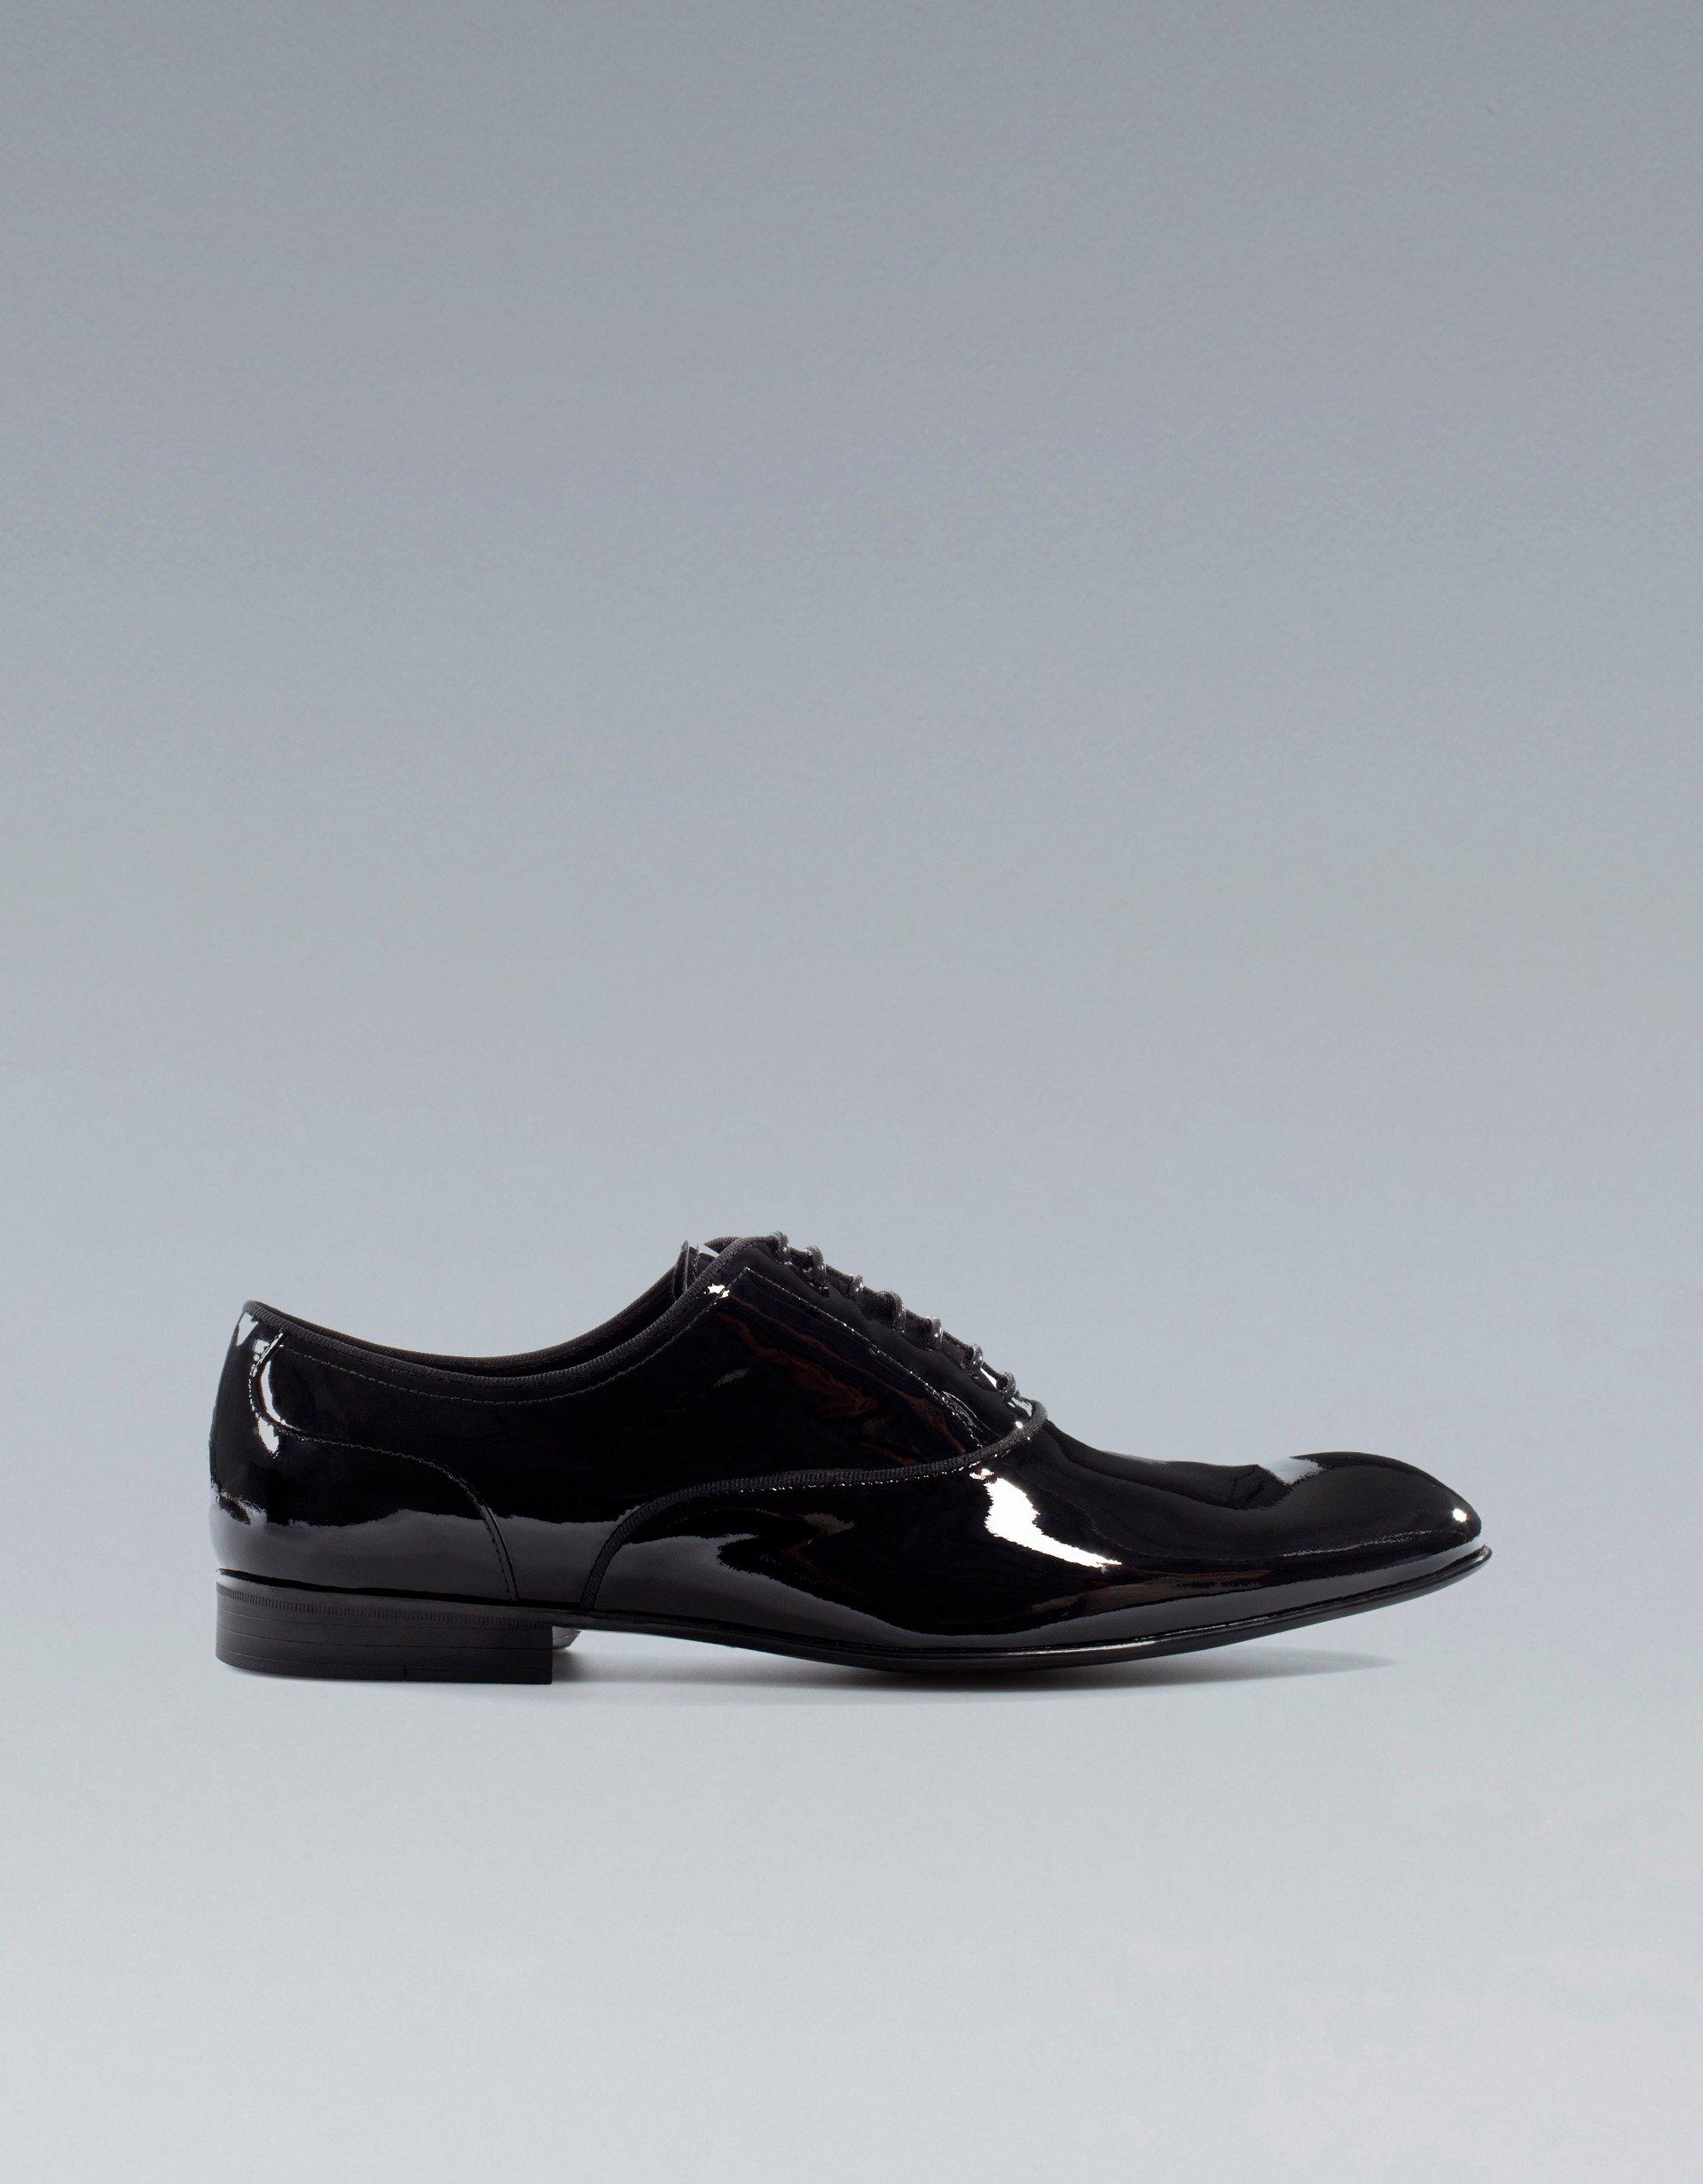 zara asymmetric patent leather oxford shoe in black for